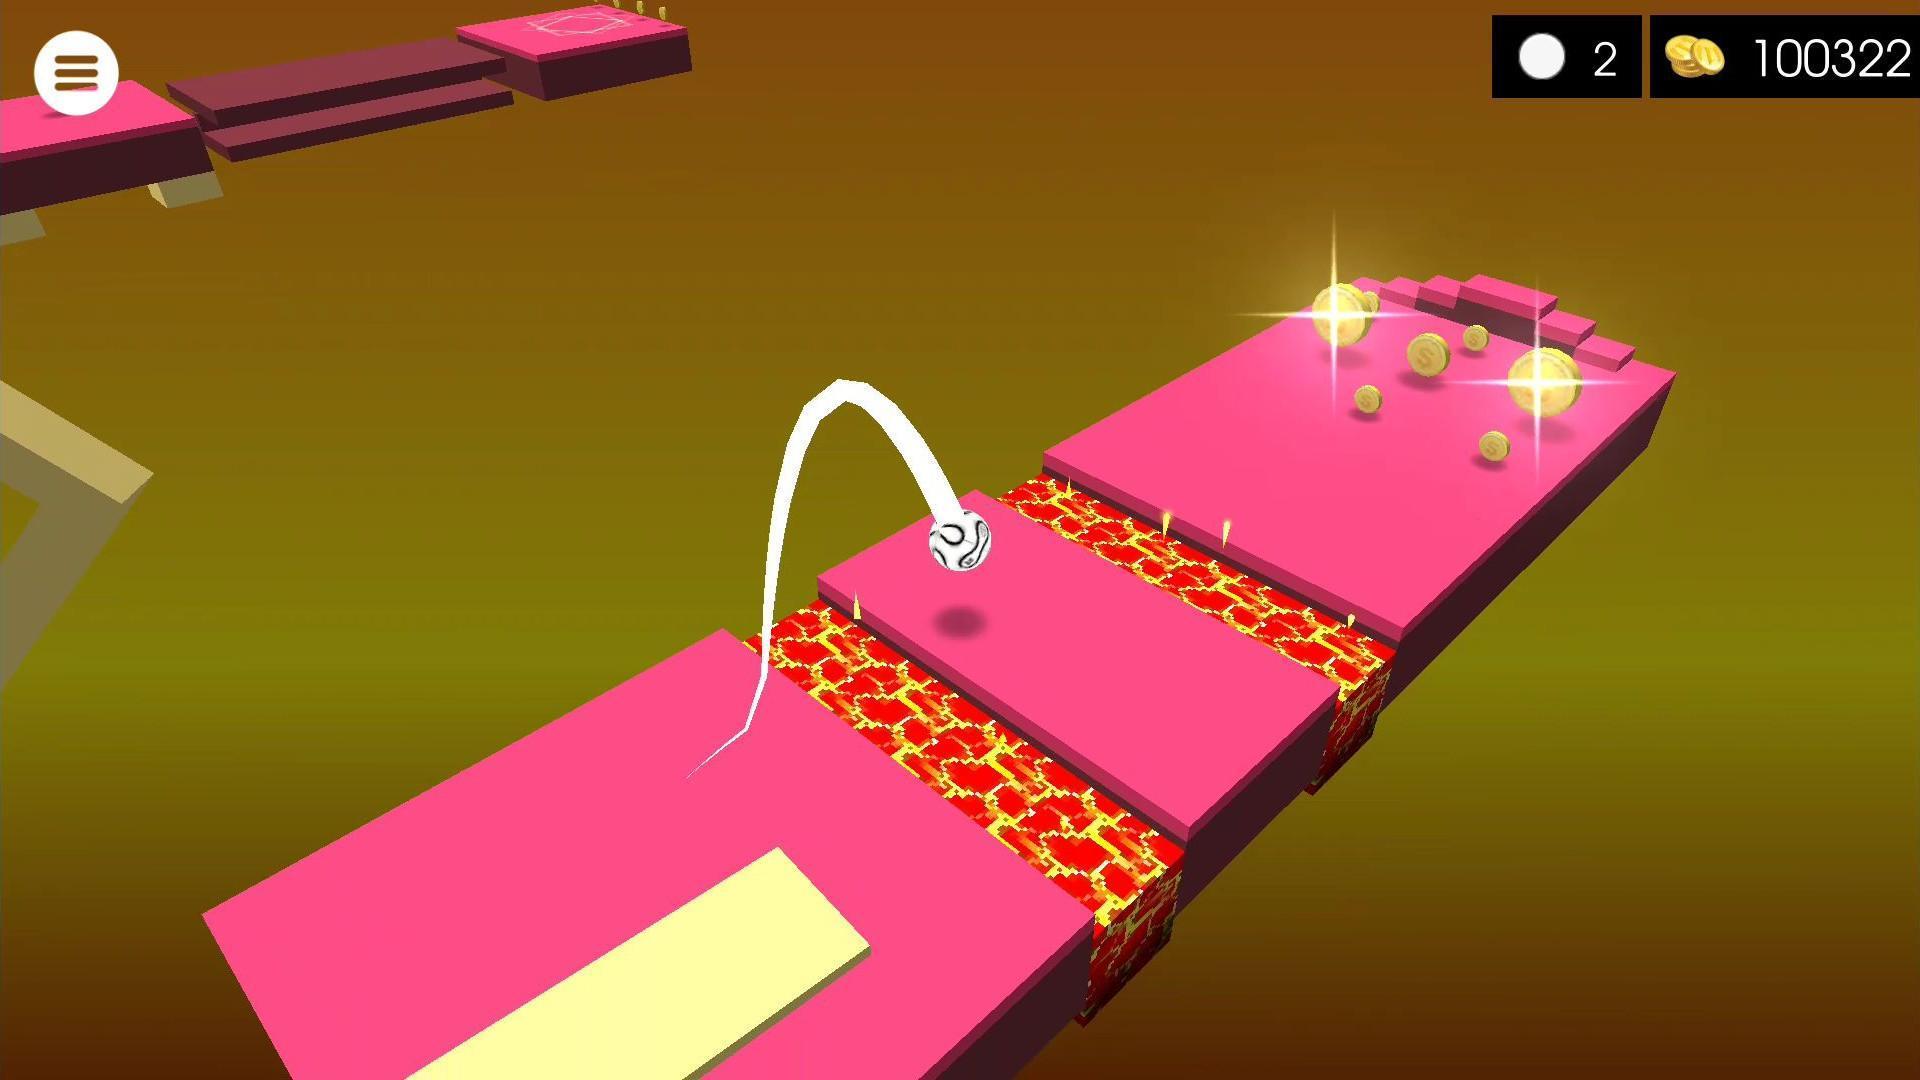 RYWO free 3D roll ball game 1.2.3 Screenshot 17